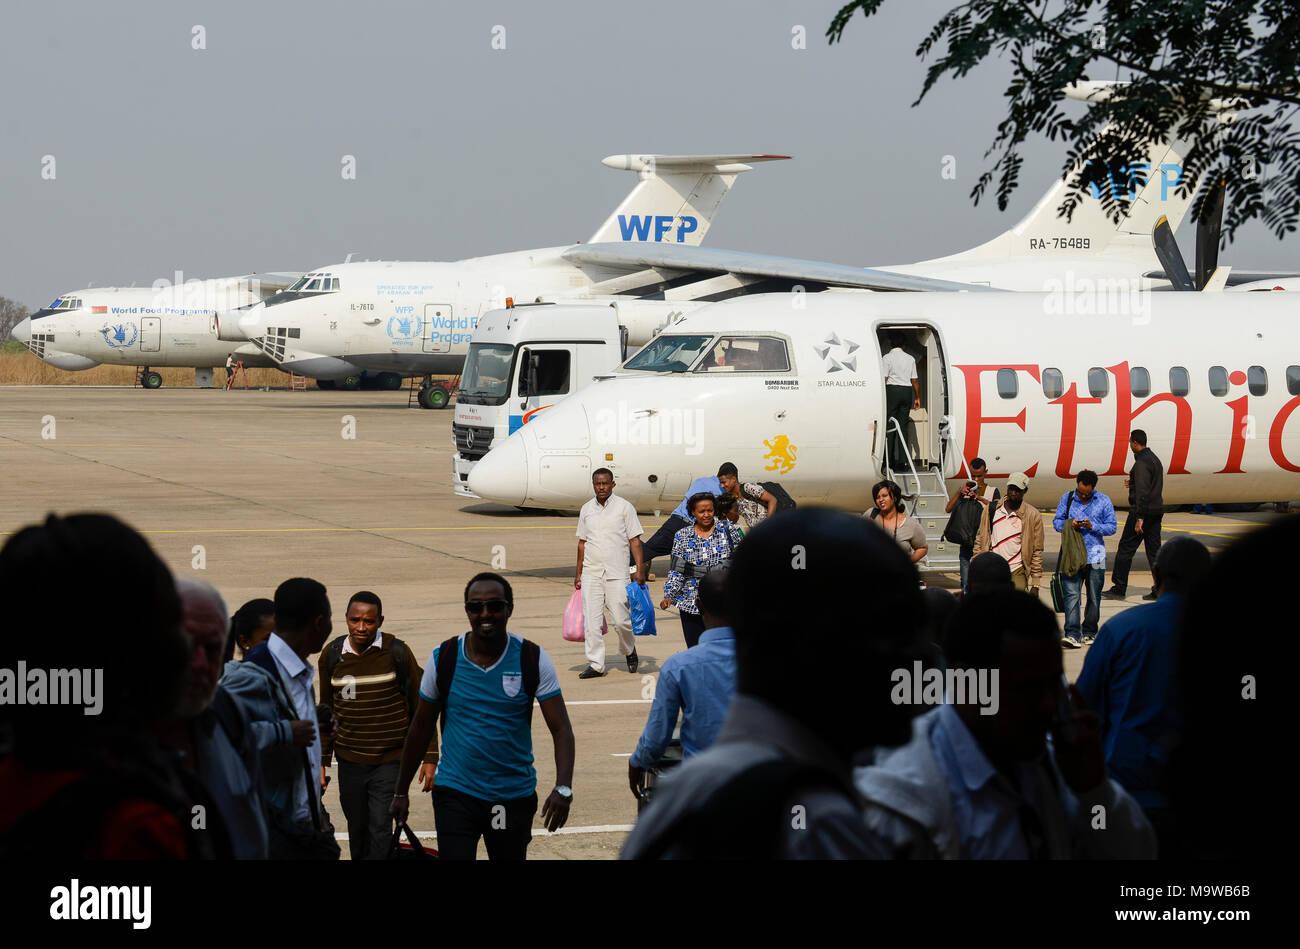 ETHIOPIA Gambela, airport, russian transport airplanes of WFP and ethiopian airlines / AETHIOPIEN Gambela, Flughafen mit Flugzeugen von WFP und Ethiopian Airlines - Stock Image